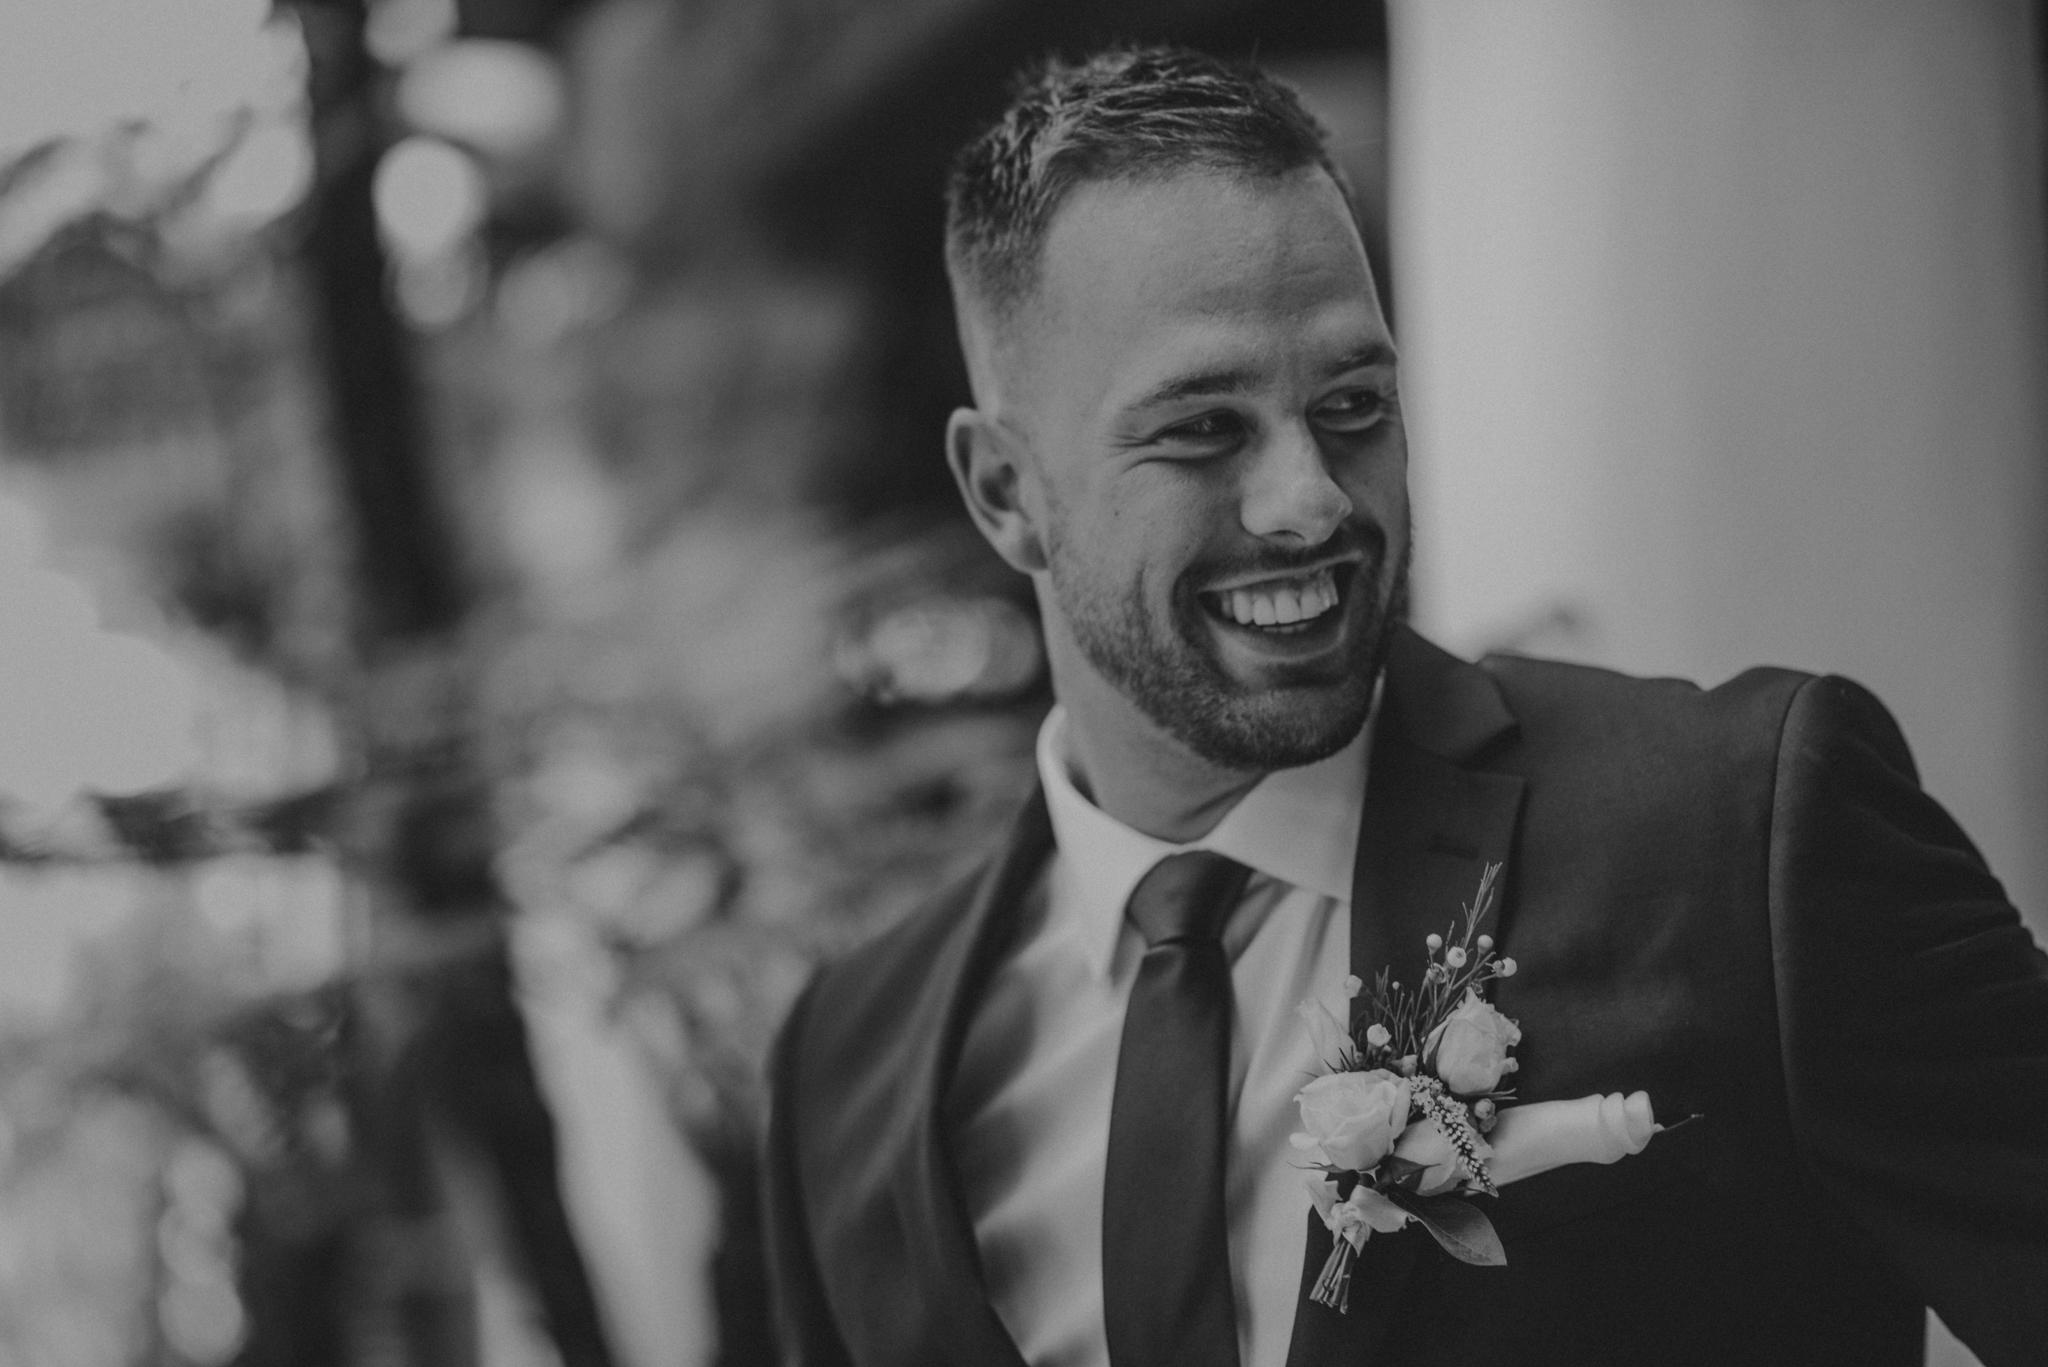 Isaiah + Taylor Photography - Rancho Las Lomas Wedding, Los Angeles Wedding Photographer-024.jpg